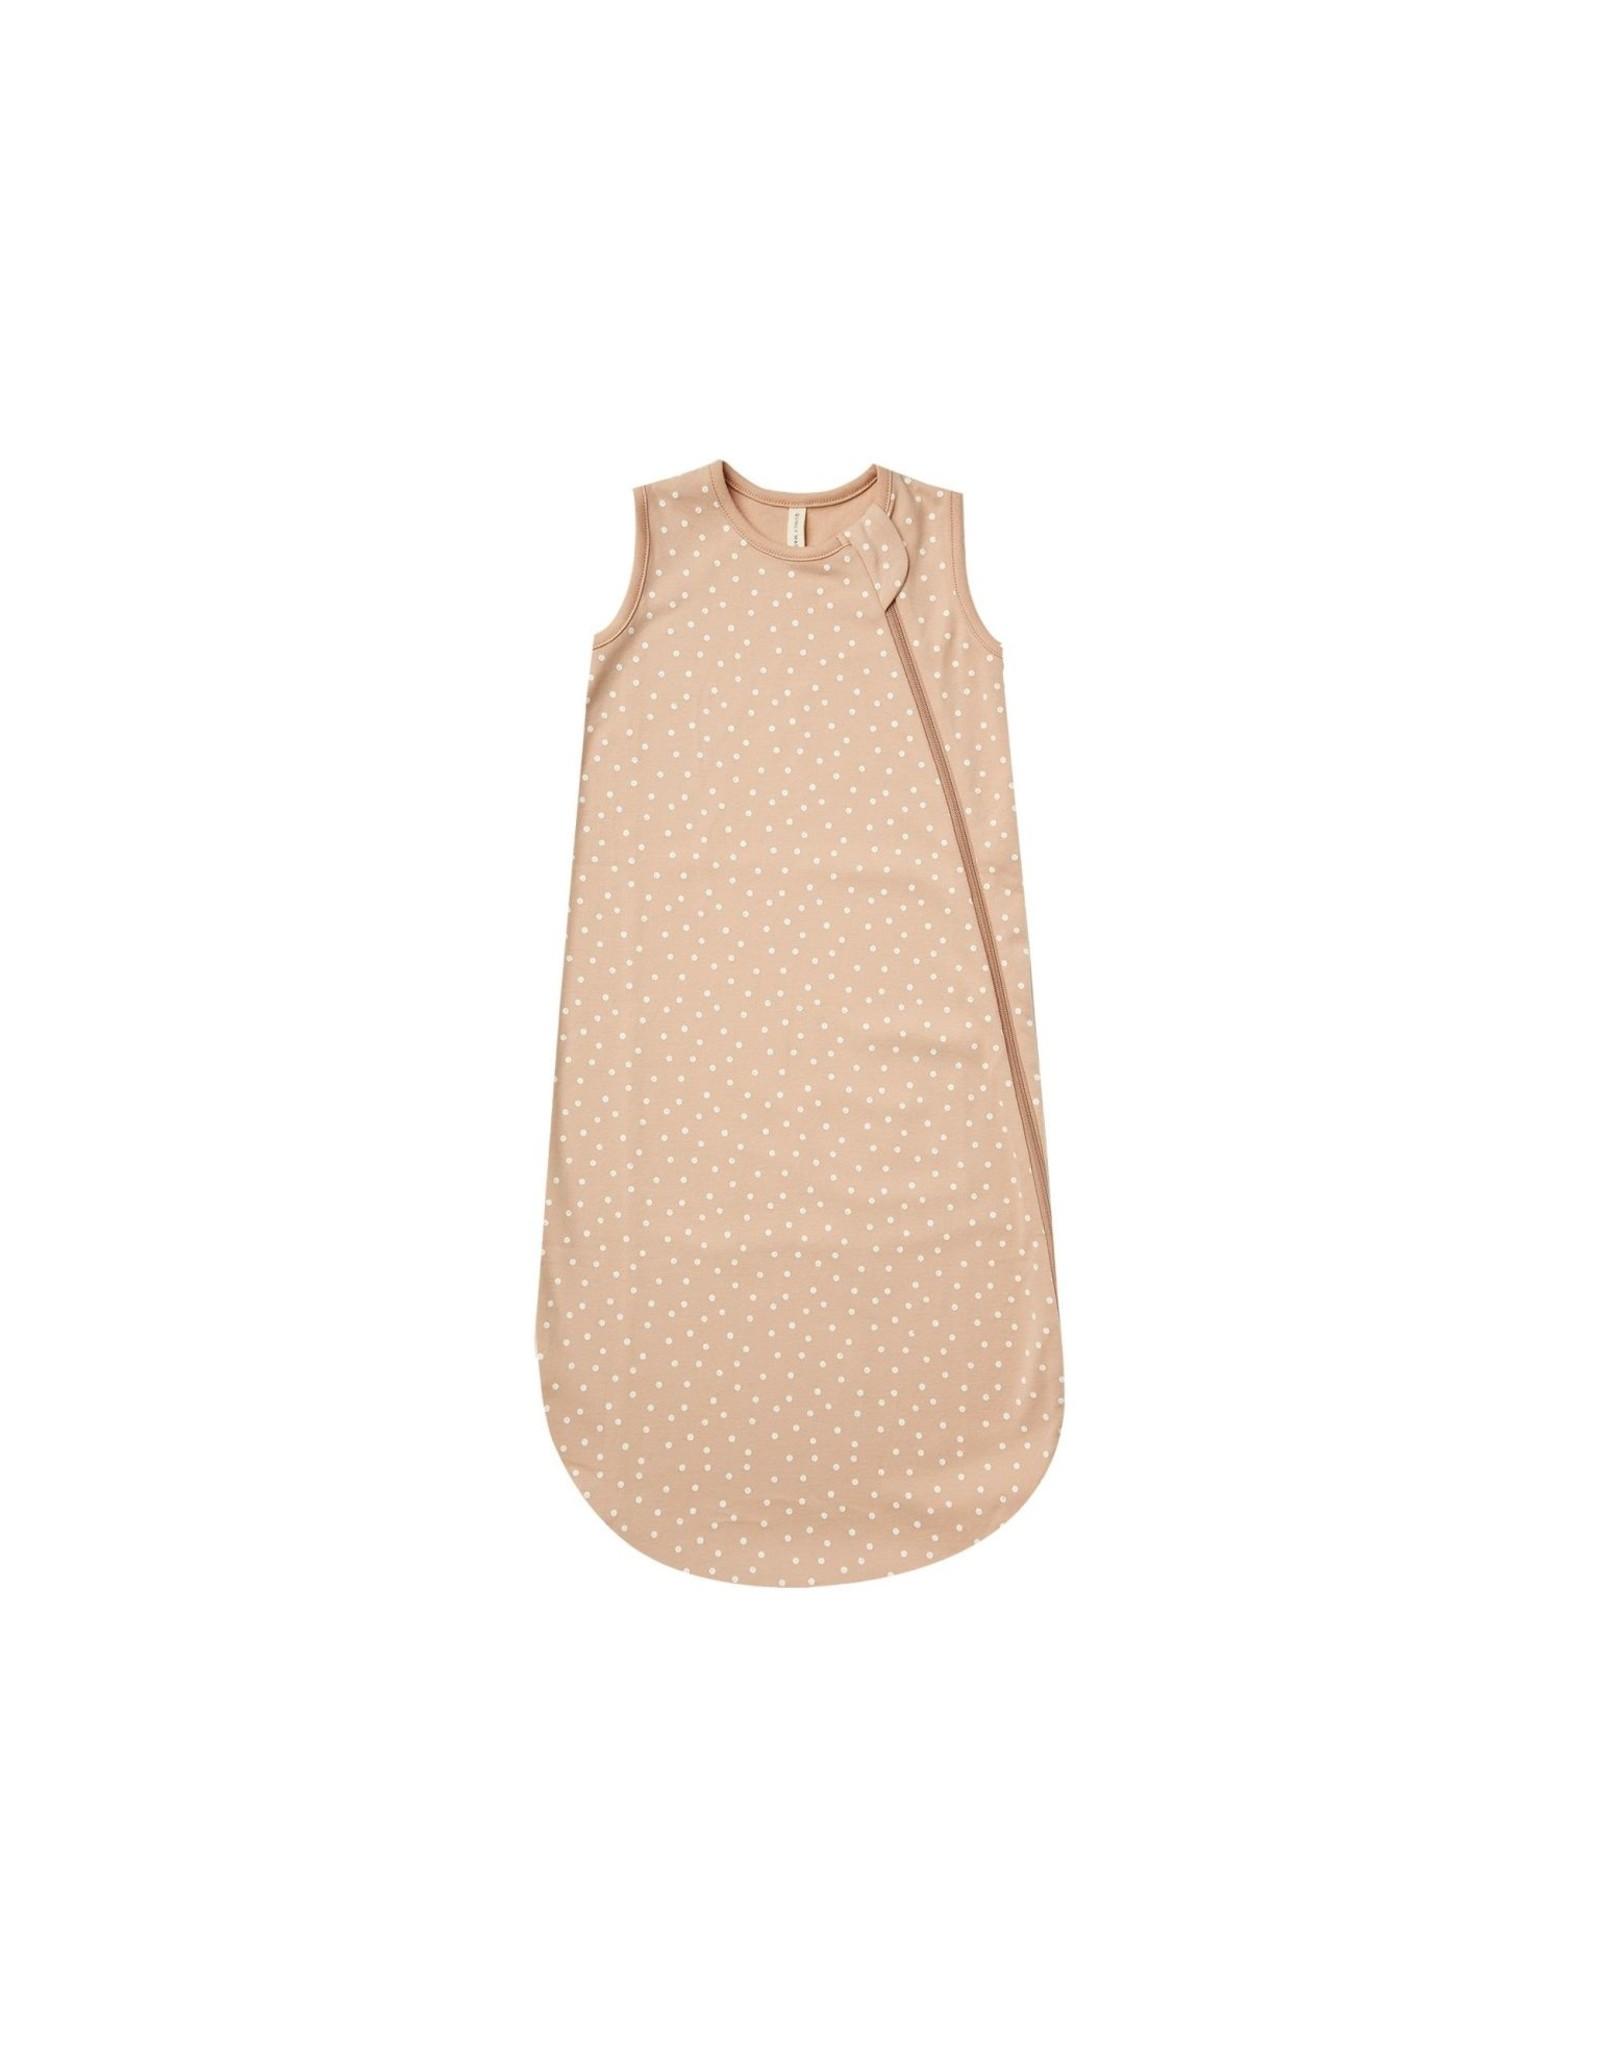 Quincy Mae sleep bag